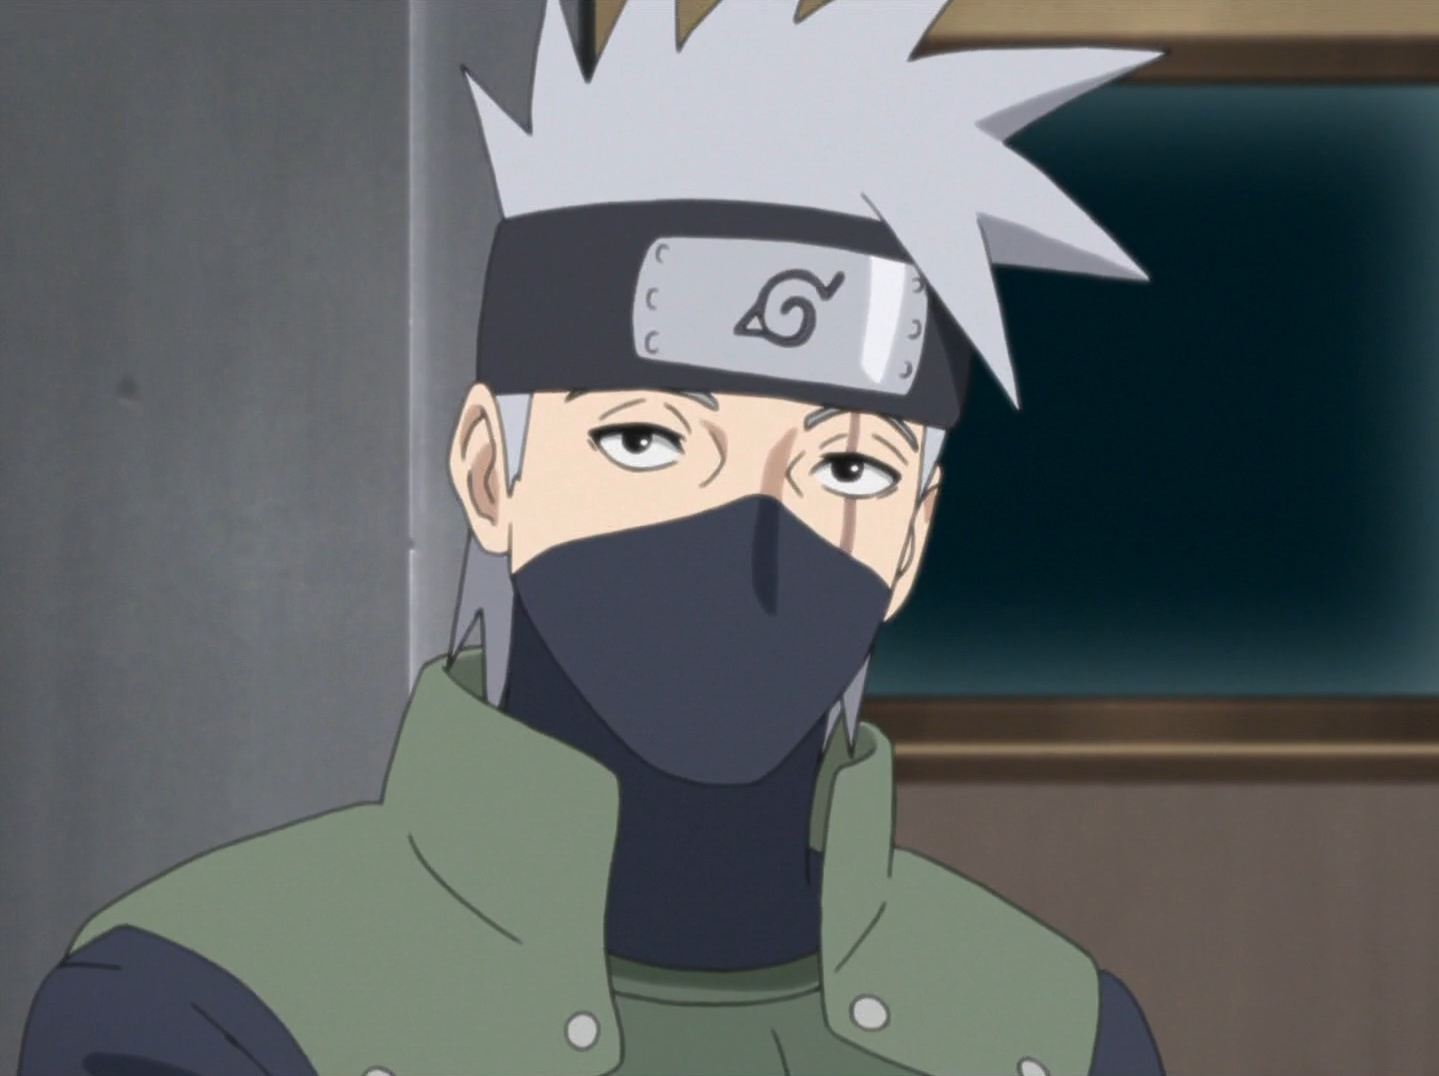 12 Tokoh Anime Berambut Putih/Perak, Manakah Favorit Mu? 7